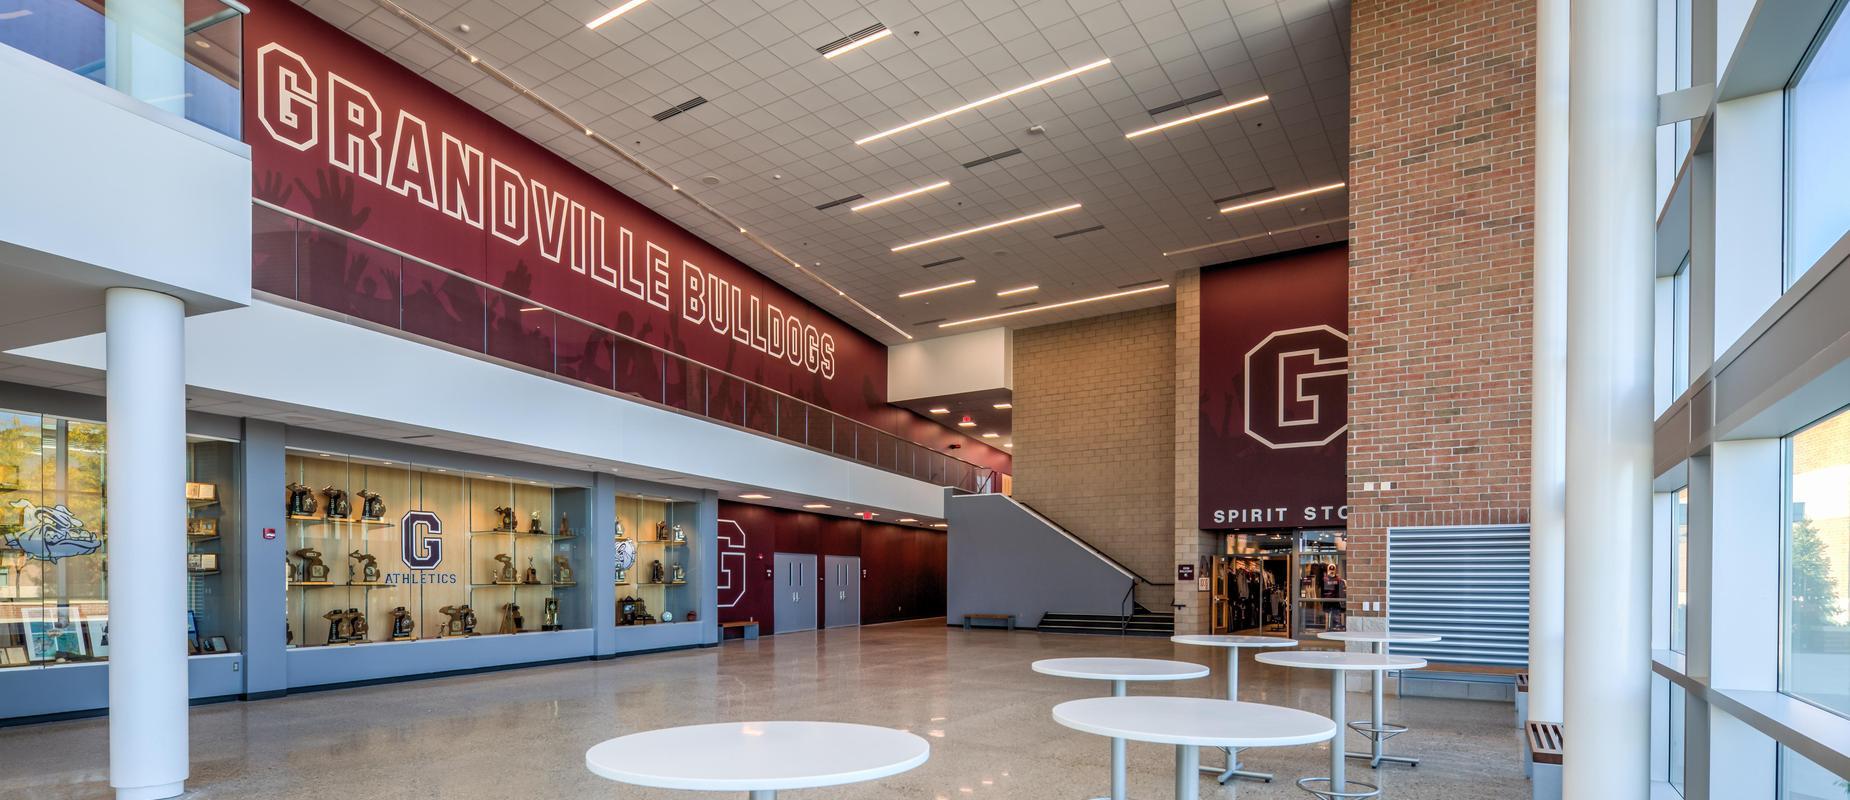 Grandville athletics entrance and spirit store